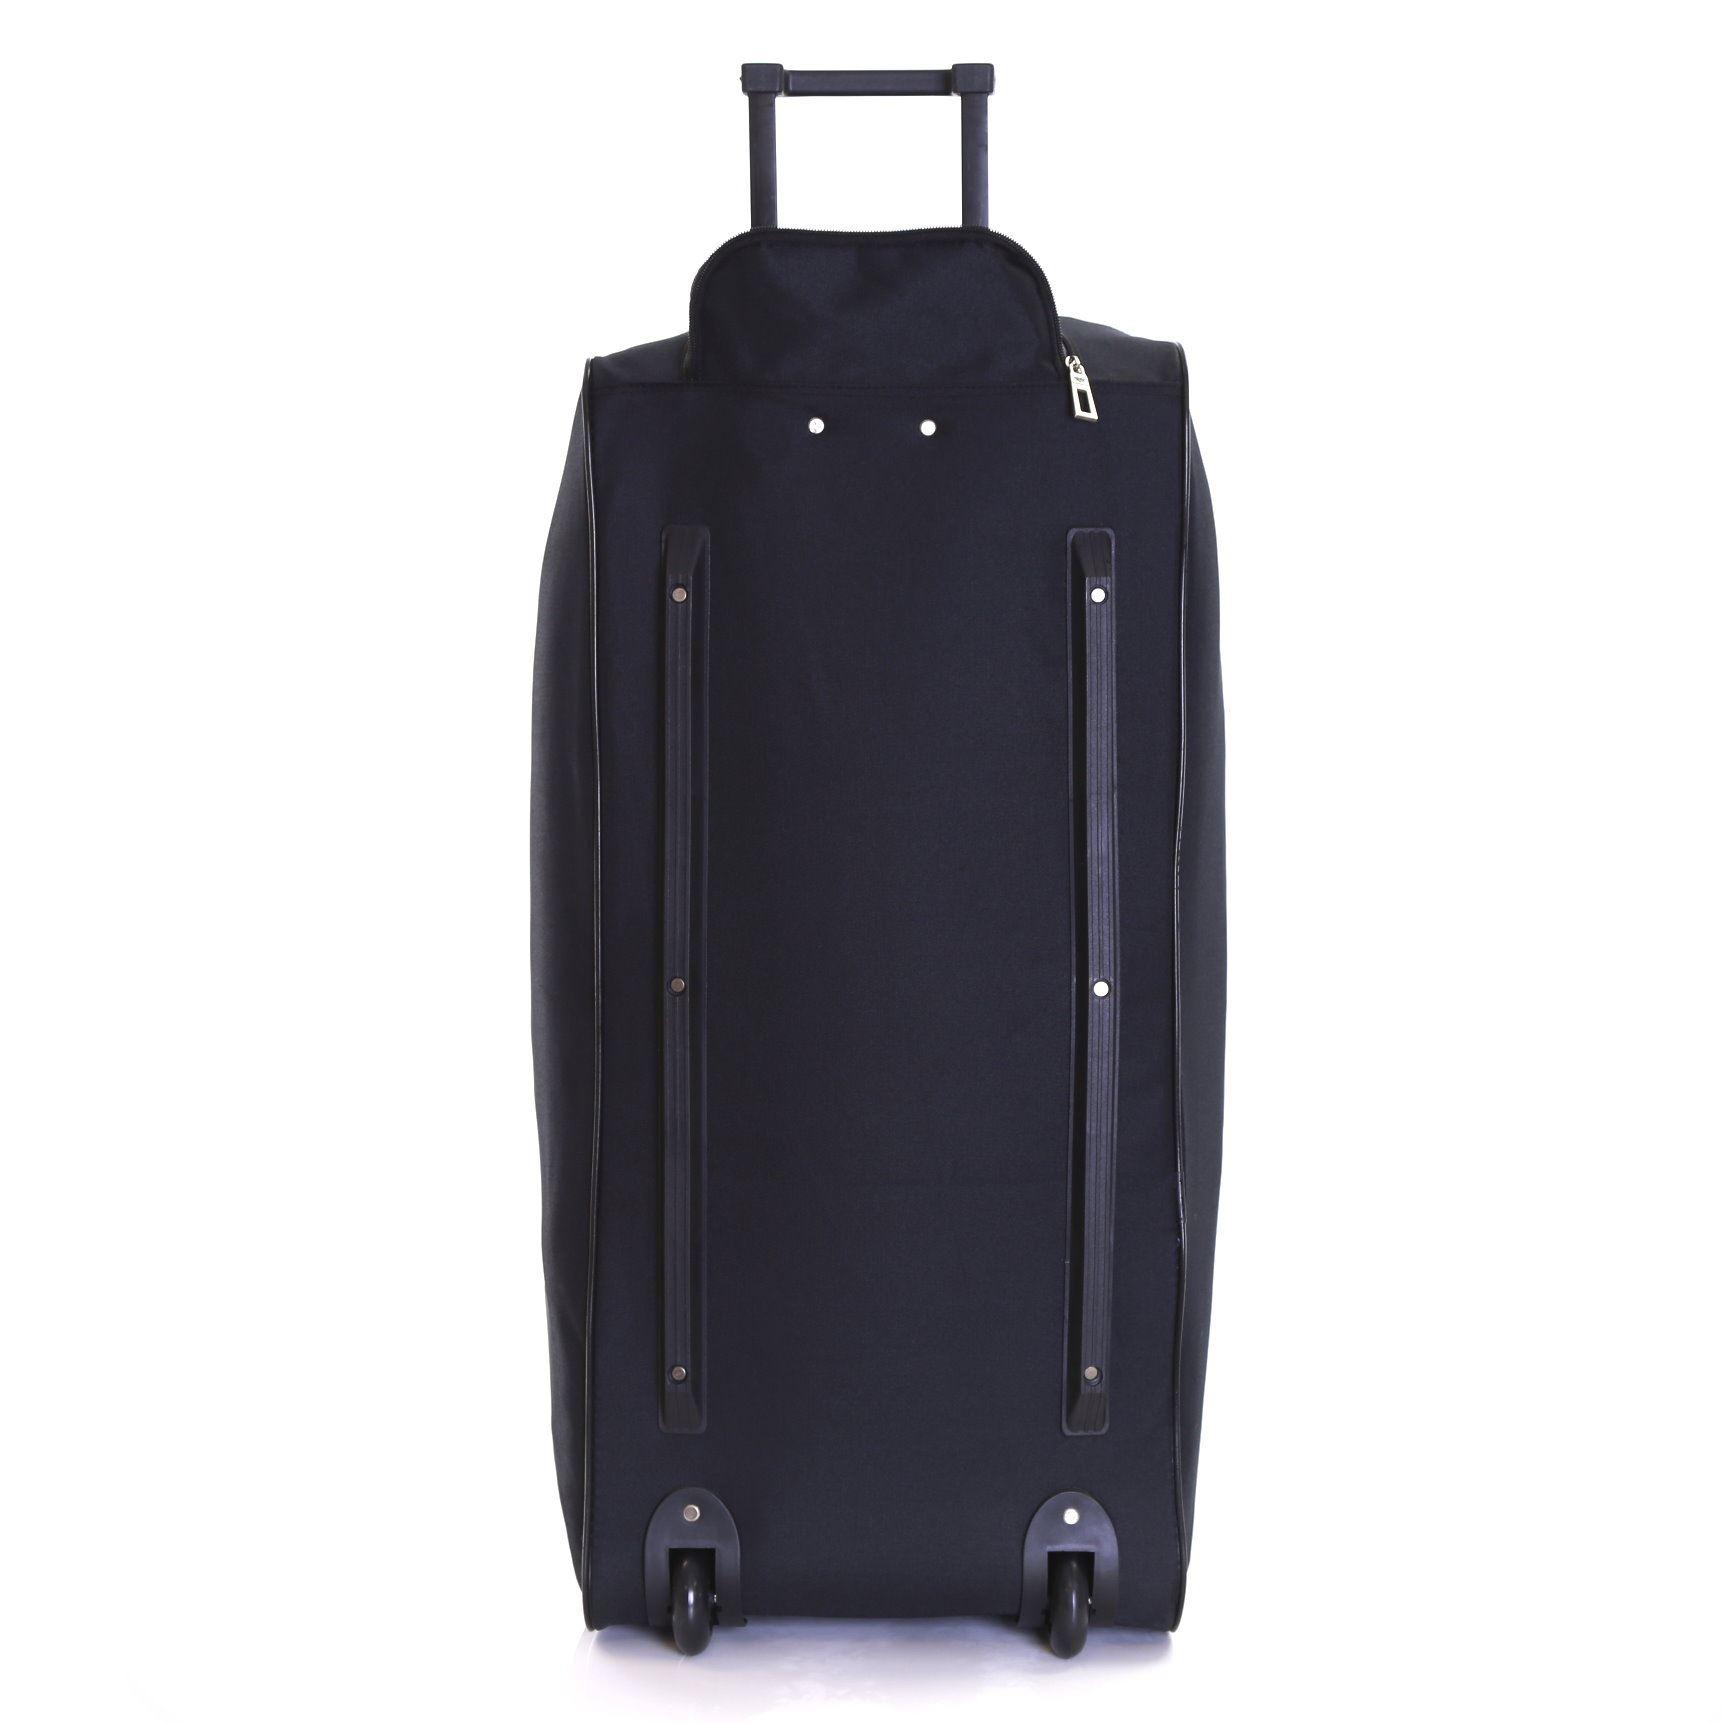 extra large xl wheeled travel luggage trolley holdall suitcase case bag wheels ebay. Black Bedroom Furniture Sets. Home Design Ideas